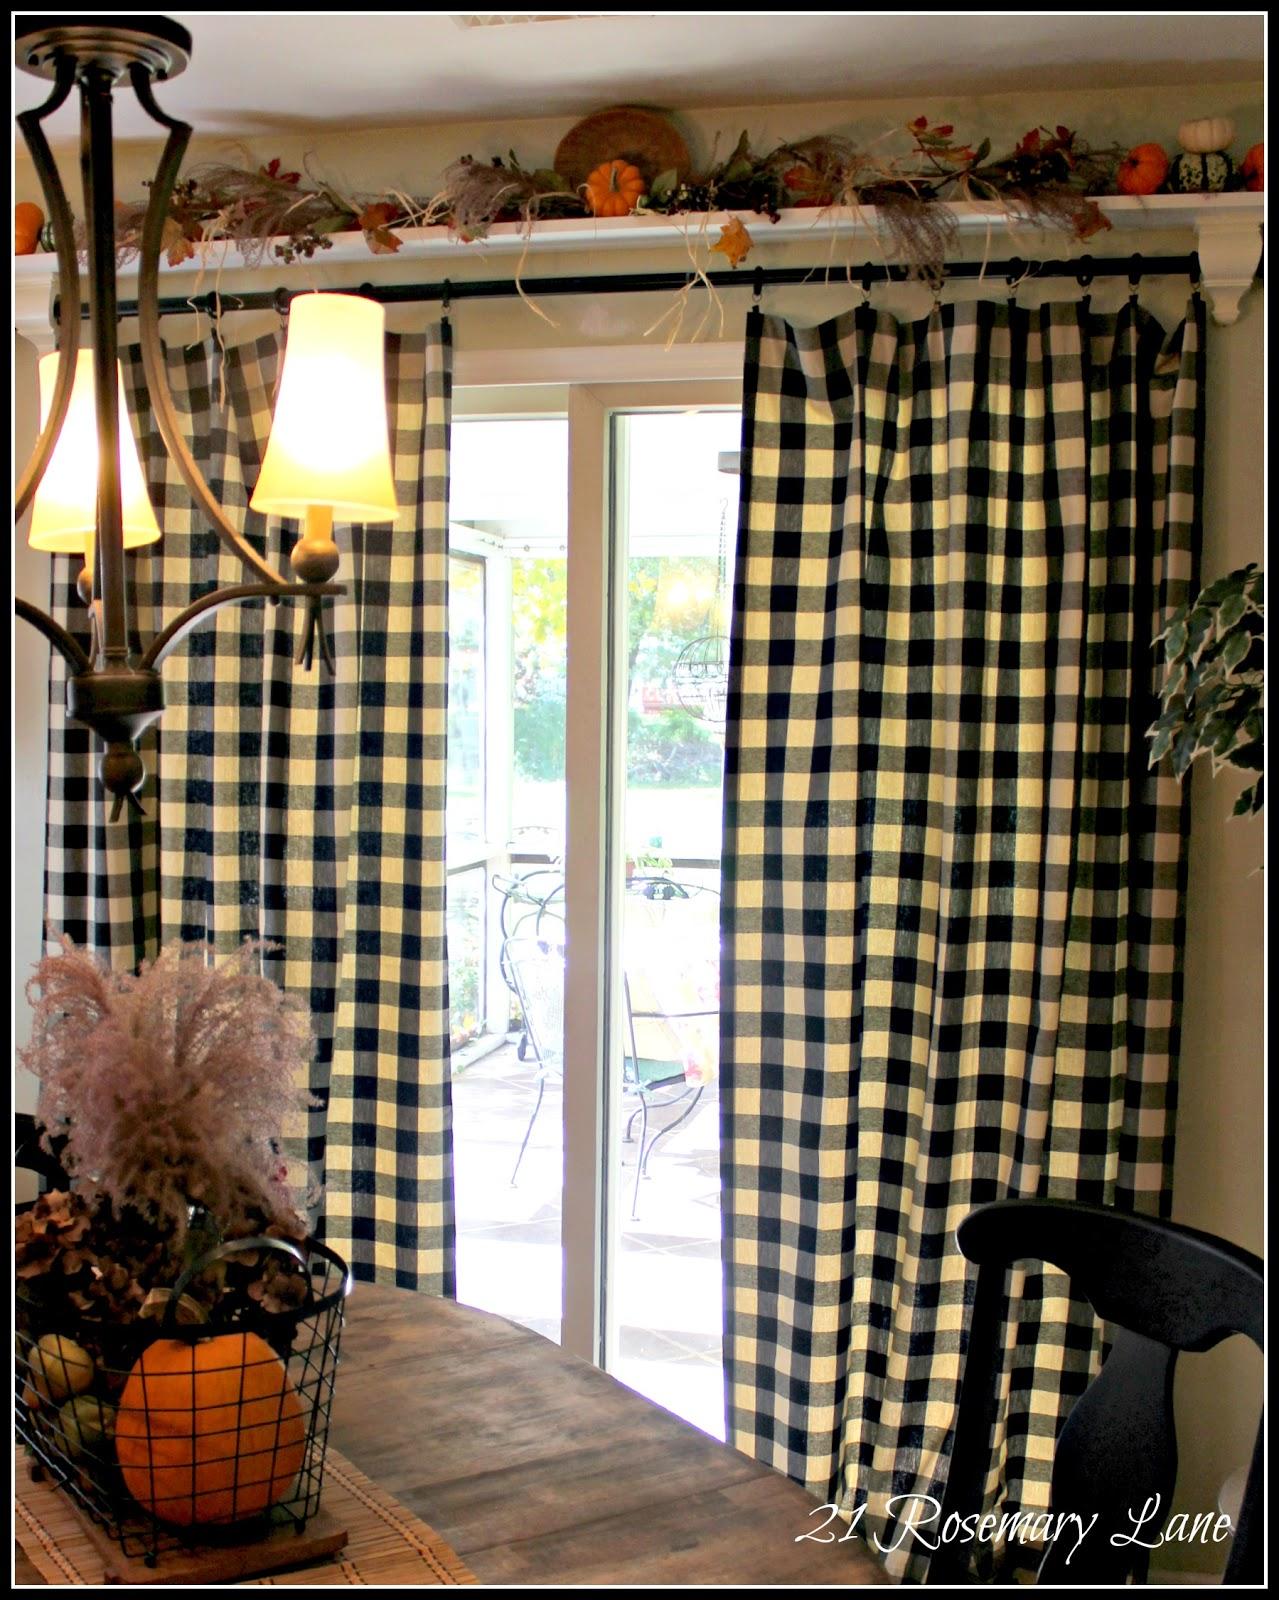 21 Rosemary Lane Easy Decorative Over The Door Shelf